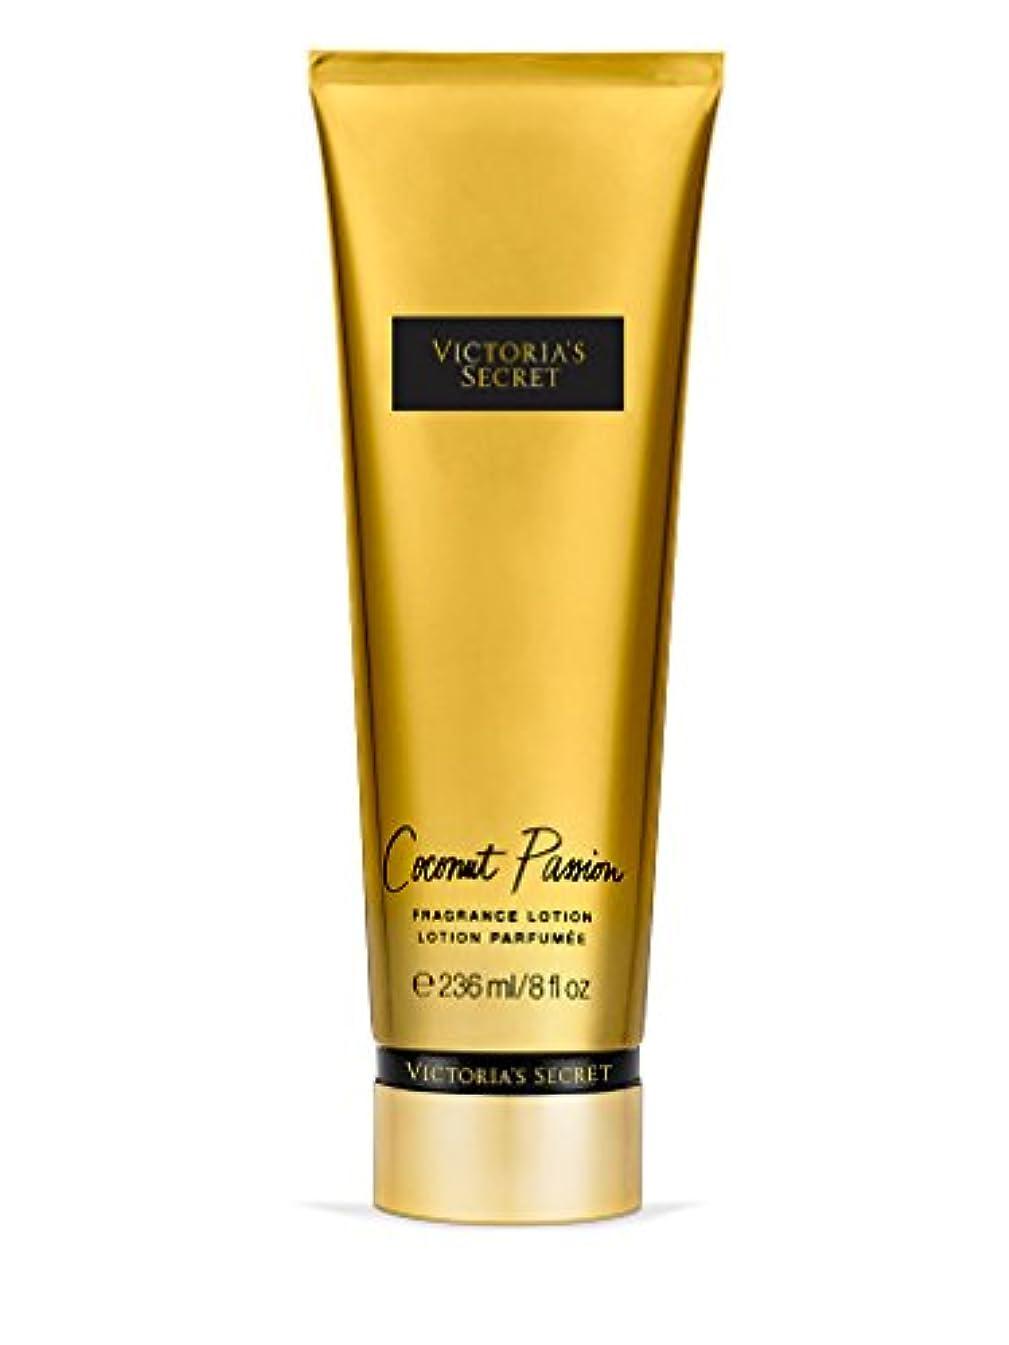 VICTORIA'S SECRET ヴィクトリアシークレット/ビクトリアシークレット ココナッツパッション フレグランスローション ( 34G-Coconut Passion ) Coconut Passion Fragrance...